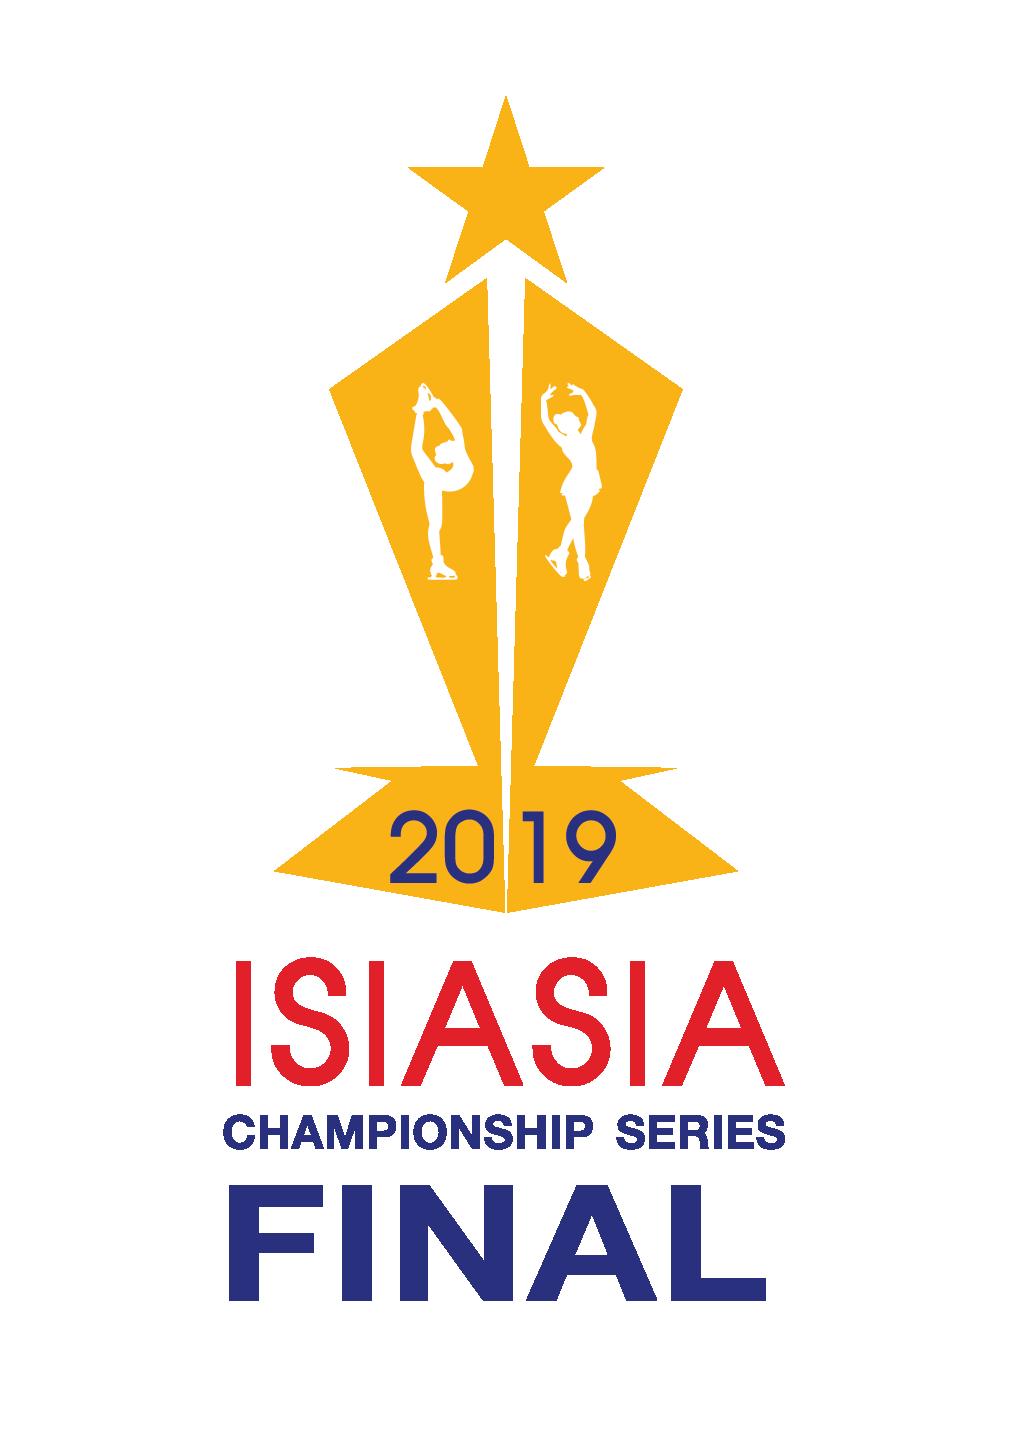 ISIAsia Championship Series Final 2019 Logo